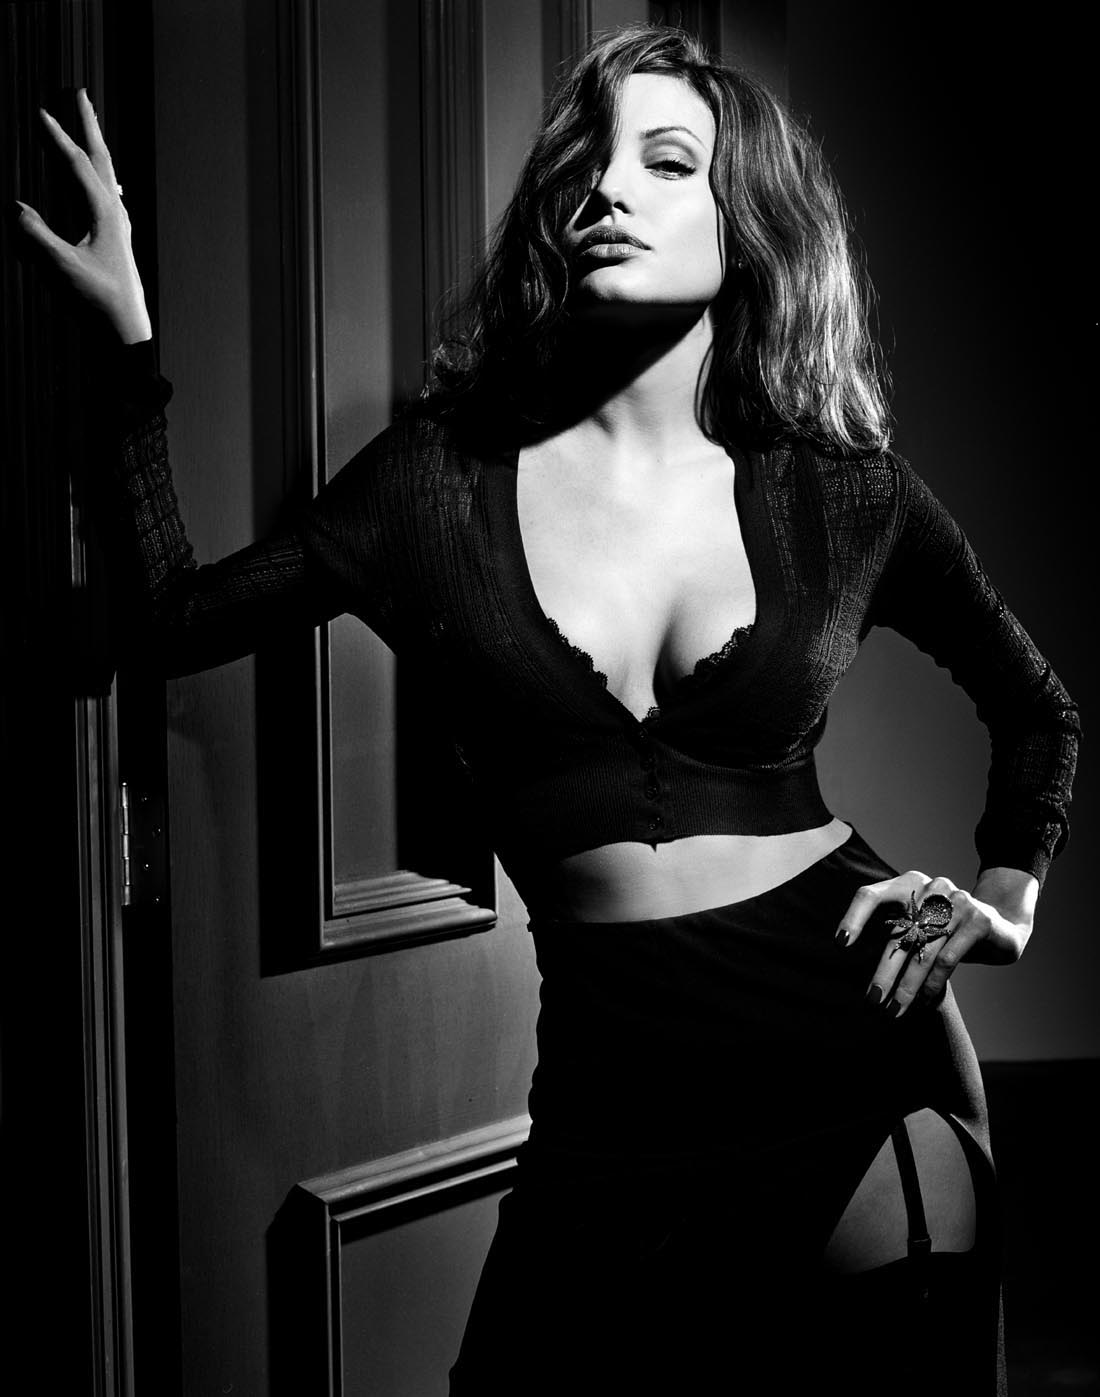 http://1.bp.blogspot.com/-djYiRP7Kw0U/T4ignV0pA_I/AAAAAAAACIM/SoVJ4B7-tNA/s1600/Angelina+Jolie+bw.jpg